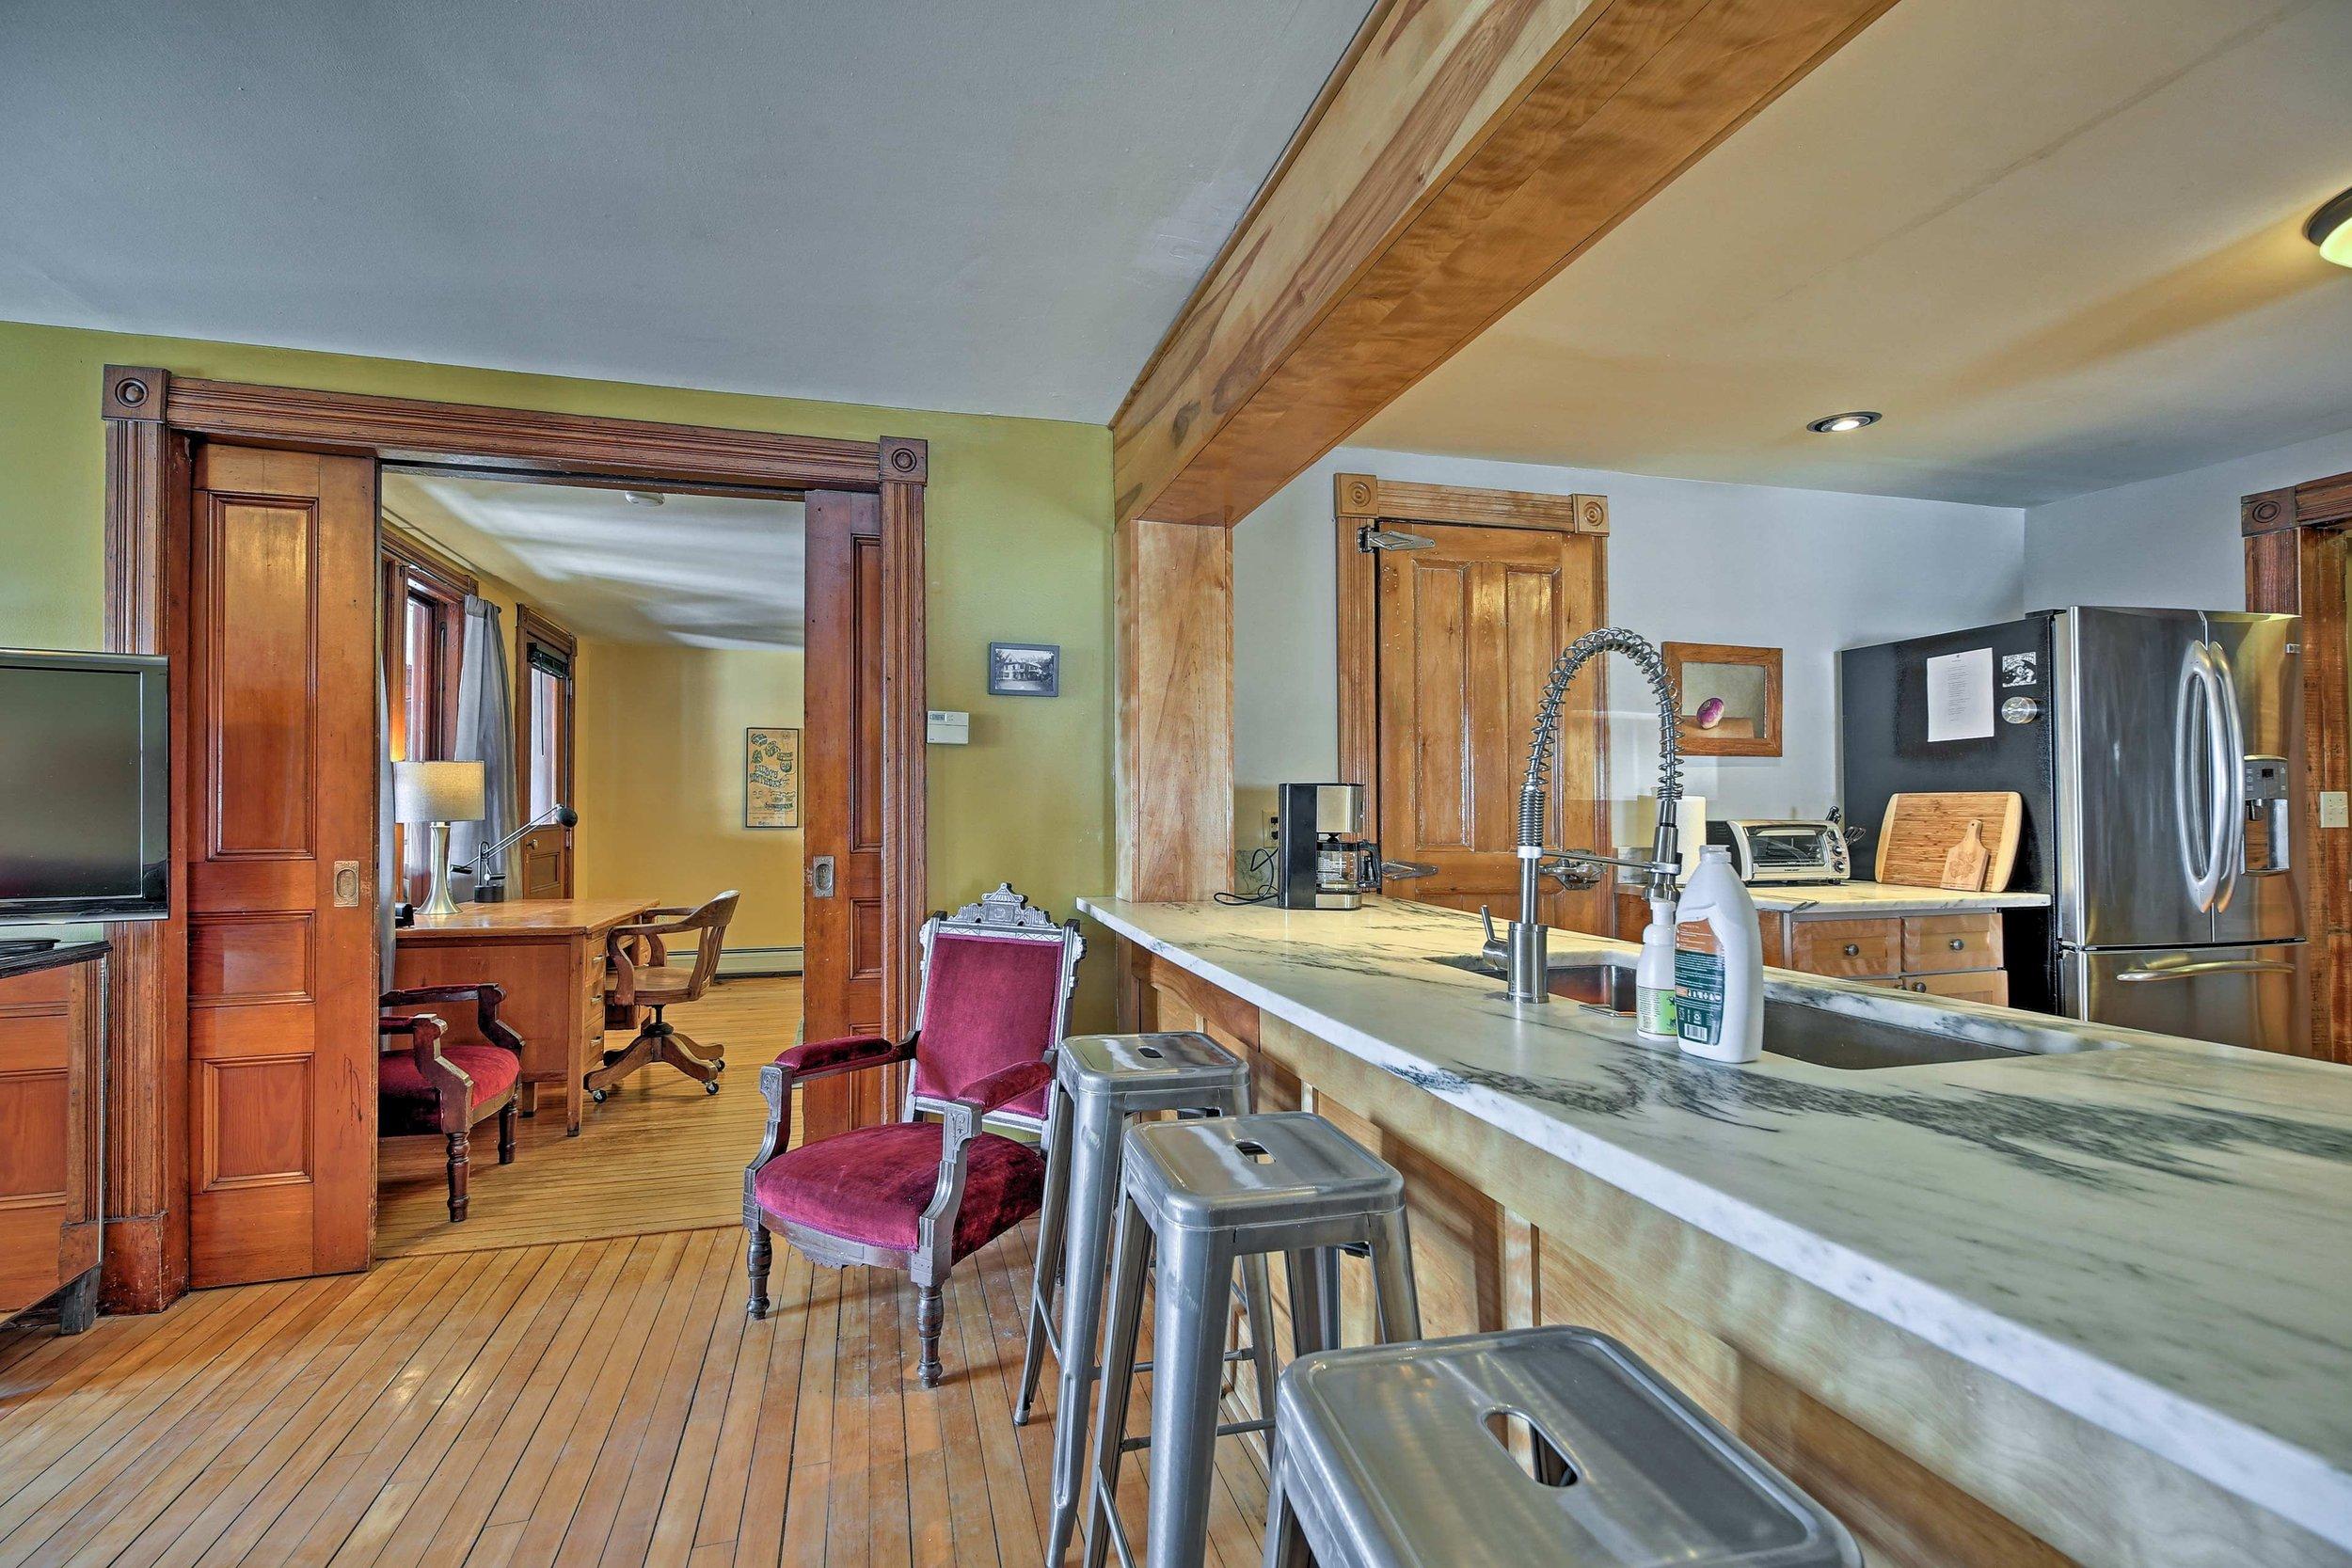 West Wing living room - Huge Danby, Vermont marble counter, 3 sets of original double pocket doors